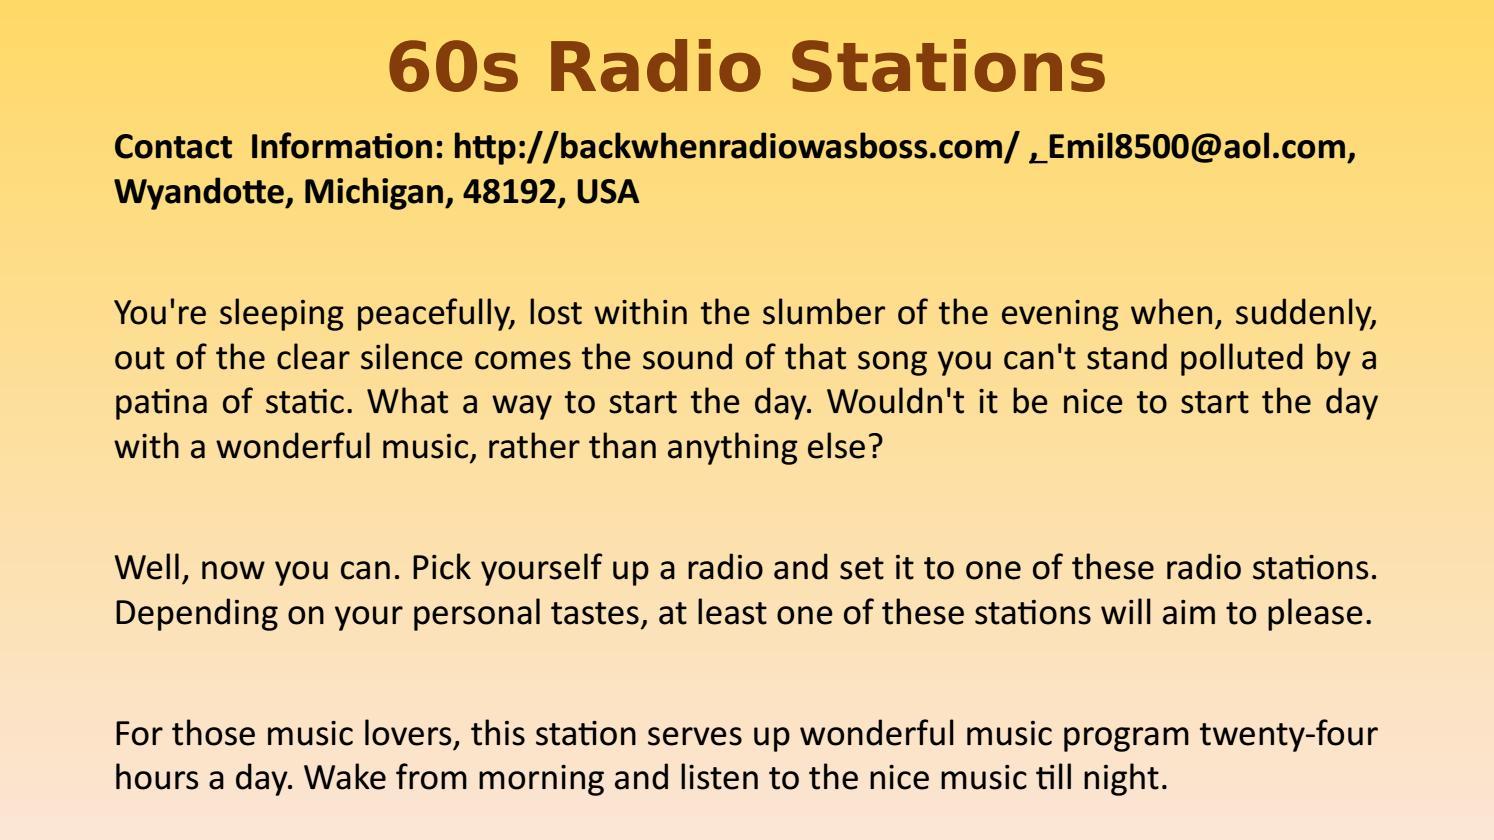 60s radio stations by Emilkovach - issuu